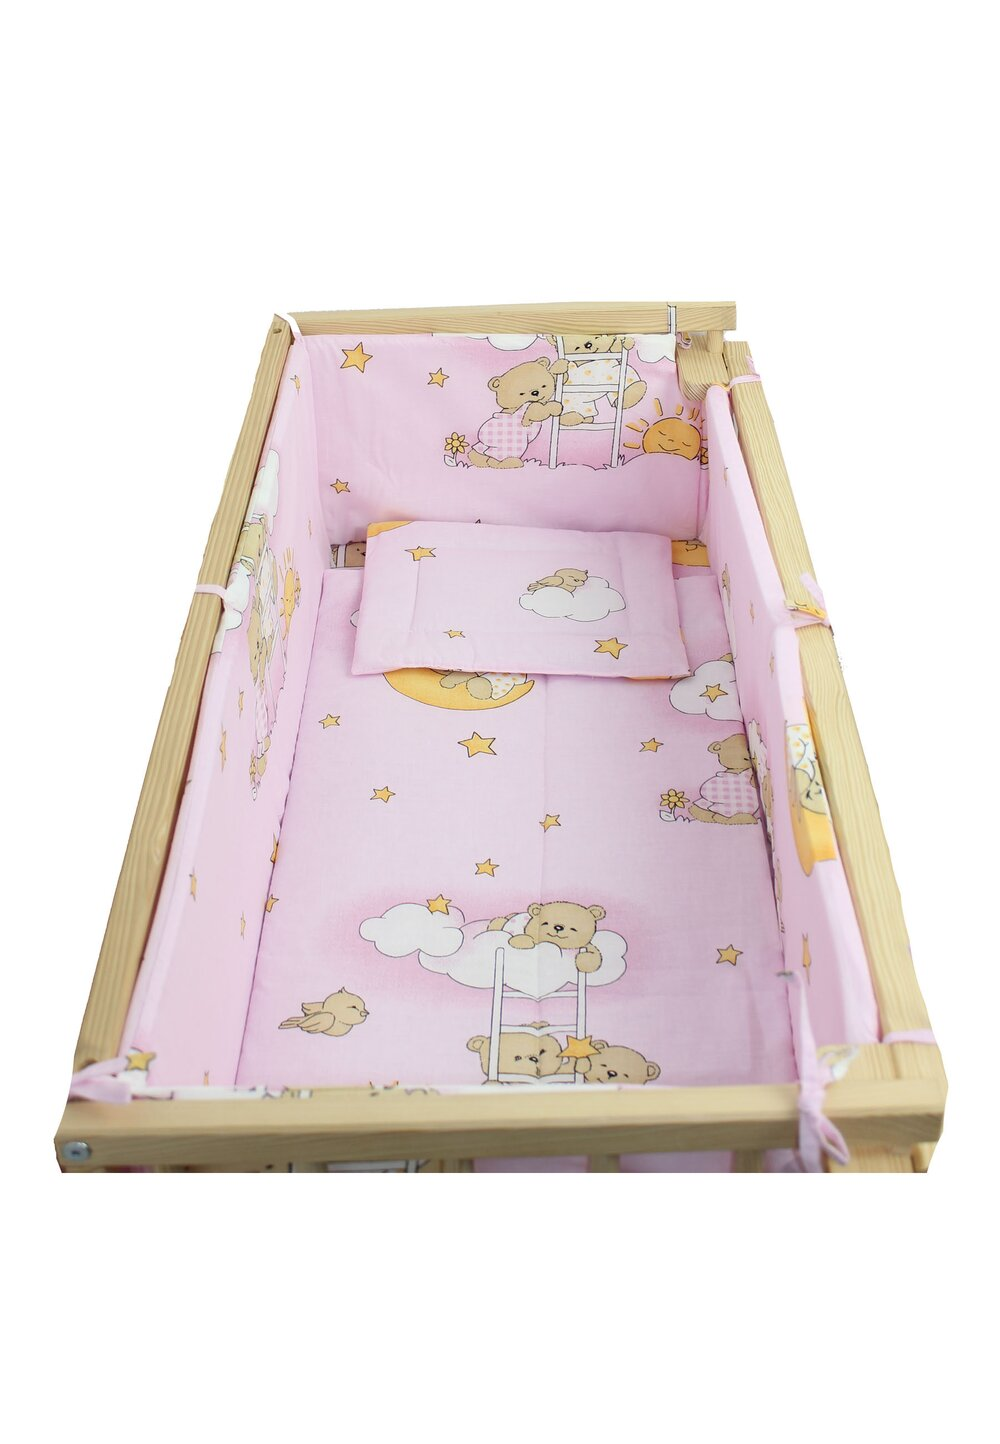 Lenjerie 5 piese, piccolo, Ursuletul somnoros roz, 95x45cm imagine